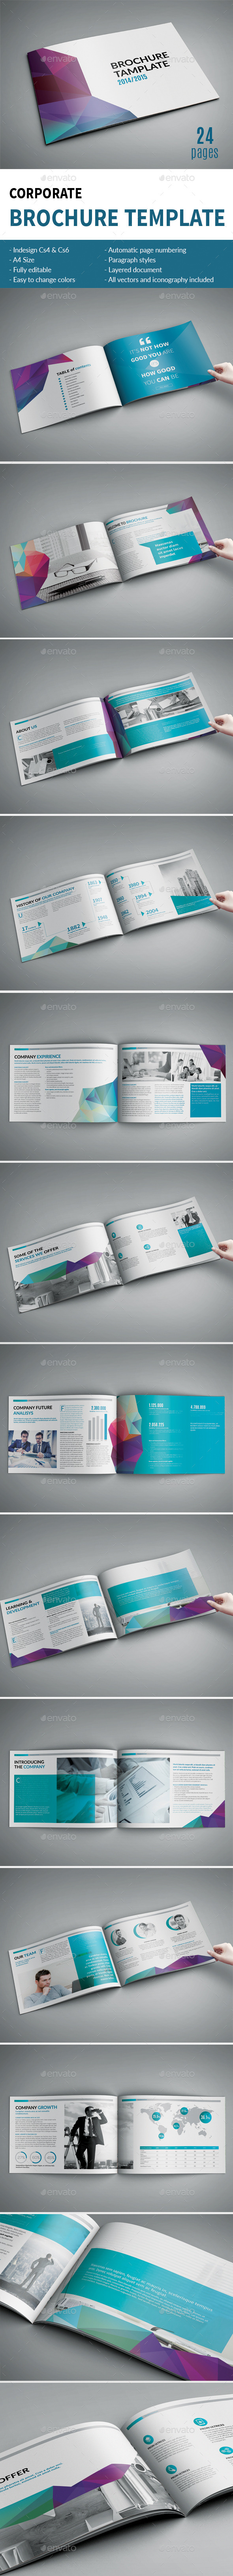 Multipurpose Corporate Brochure - Brochures Print Templates